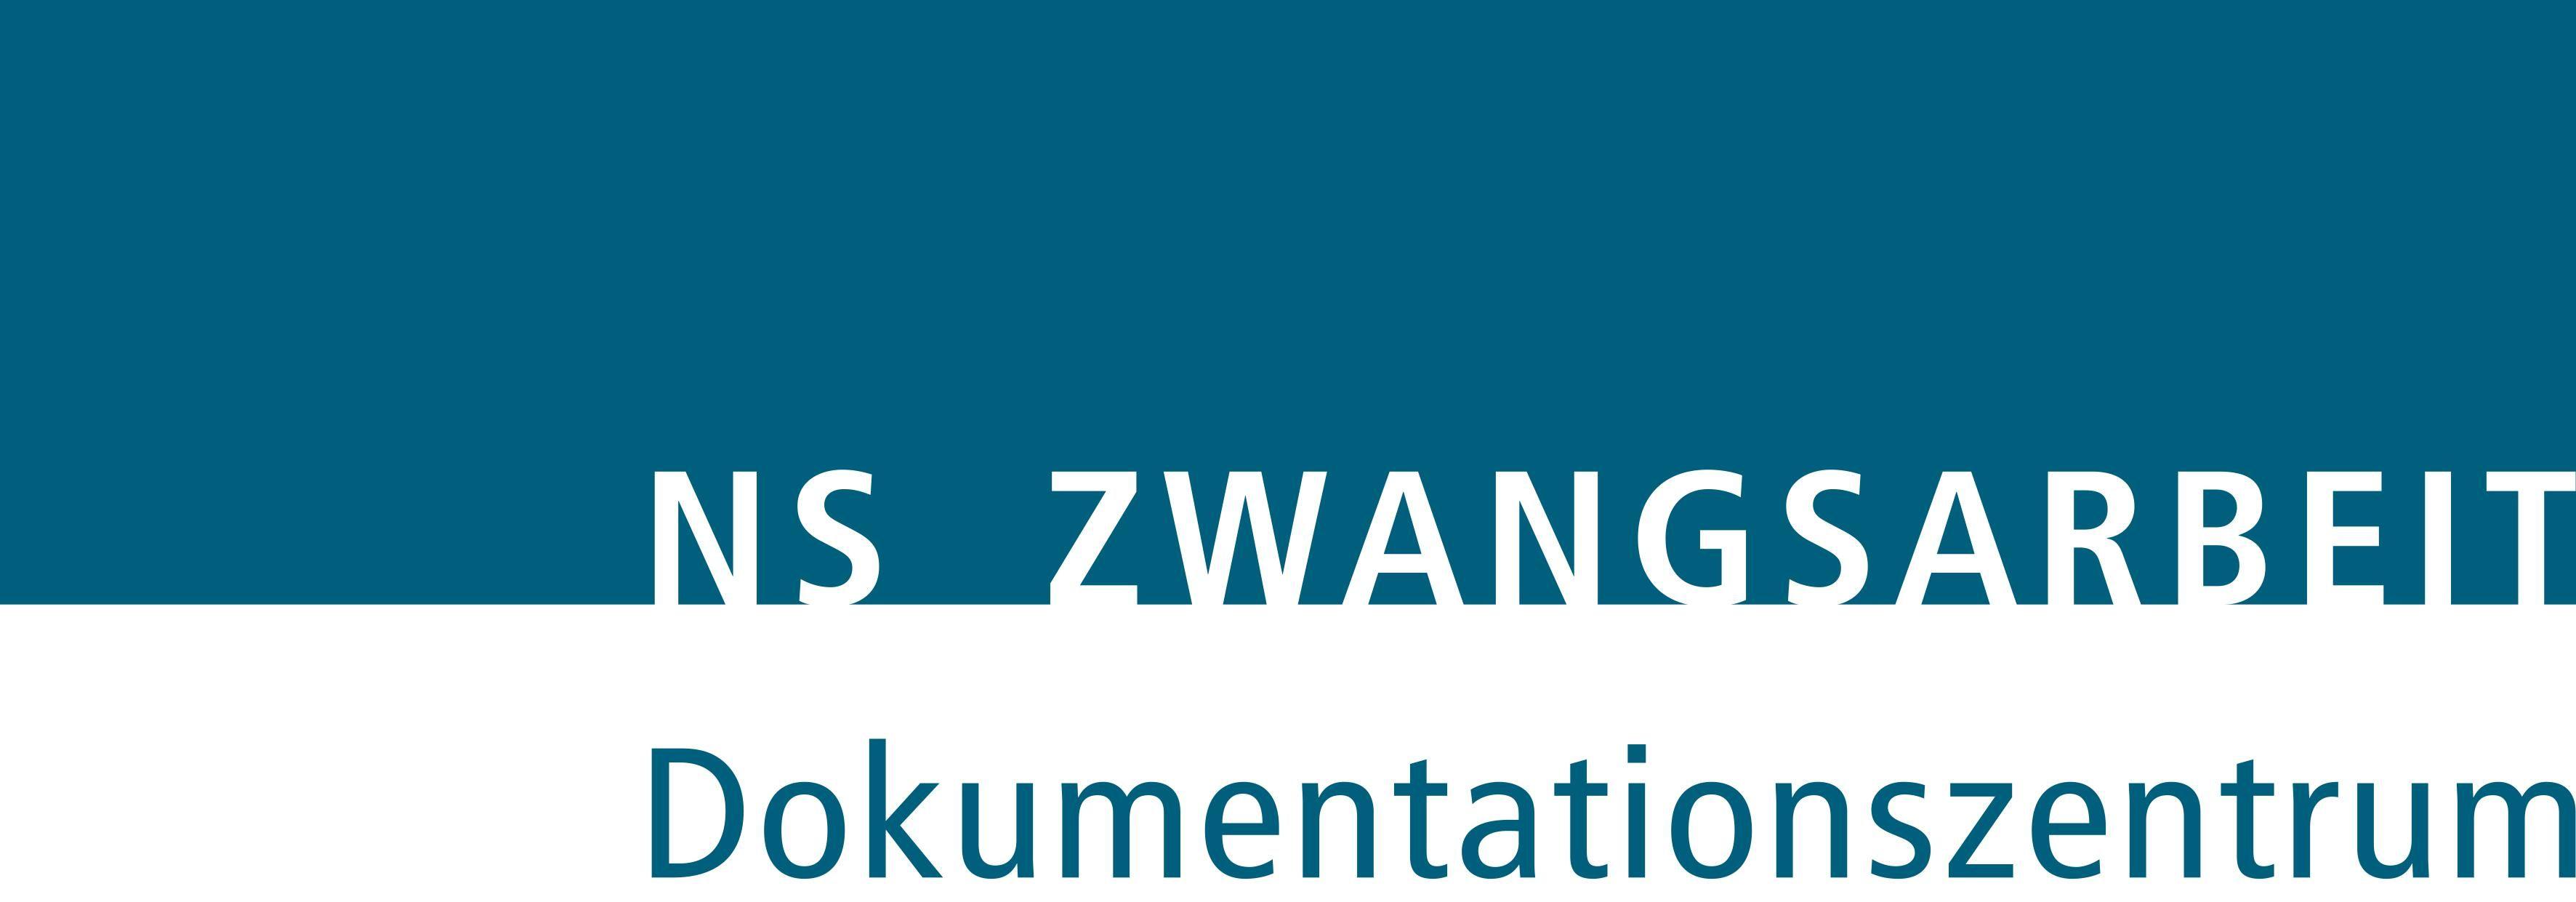 Dokumentationszentrum NS-Zwangsarbeit